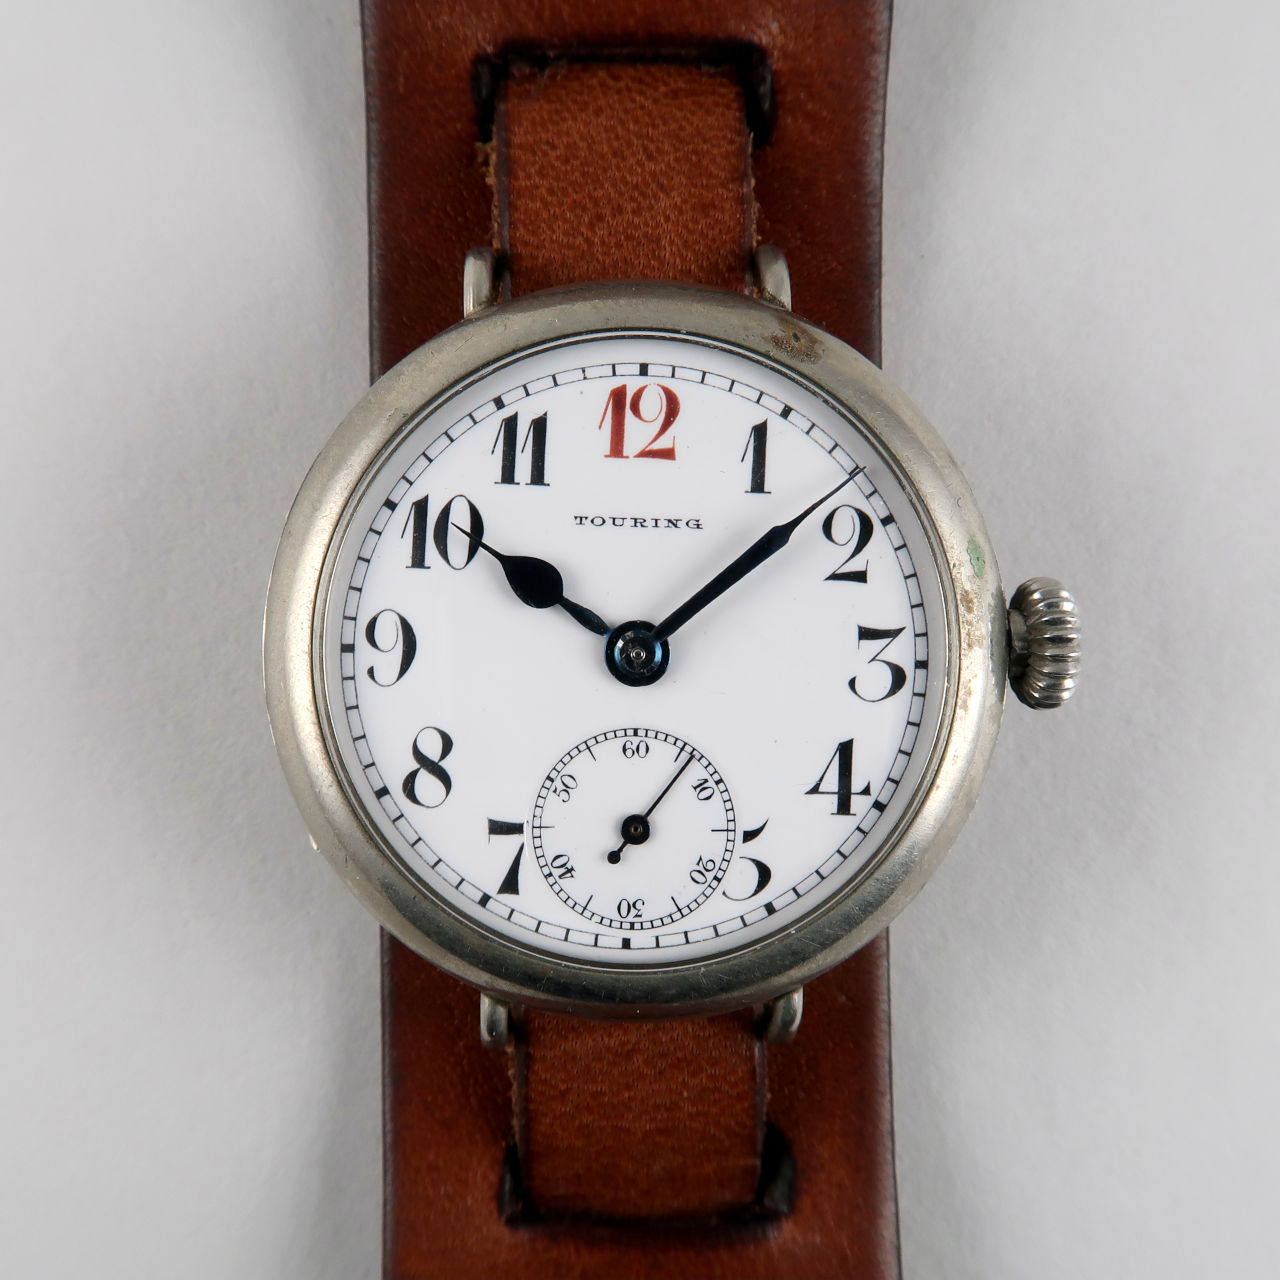 Touring circa 1915 | nickel hinged cased manual wind vintage wristwatch